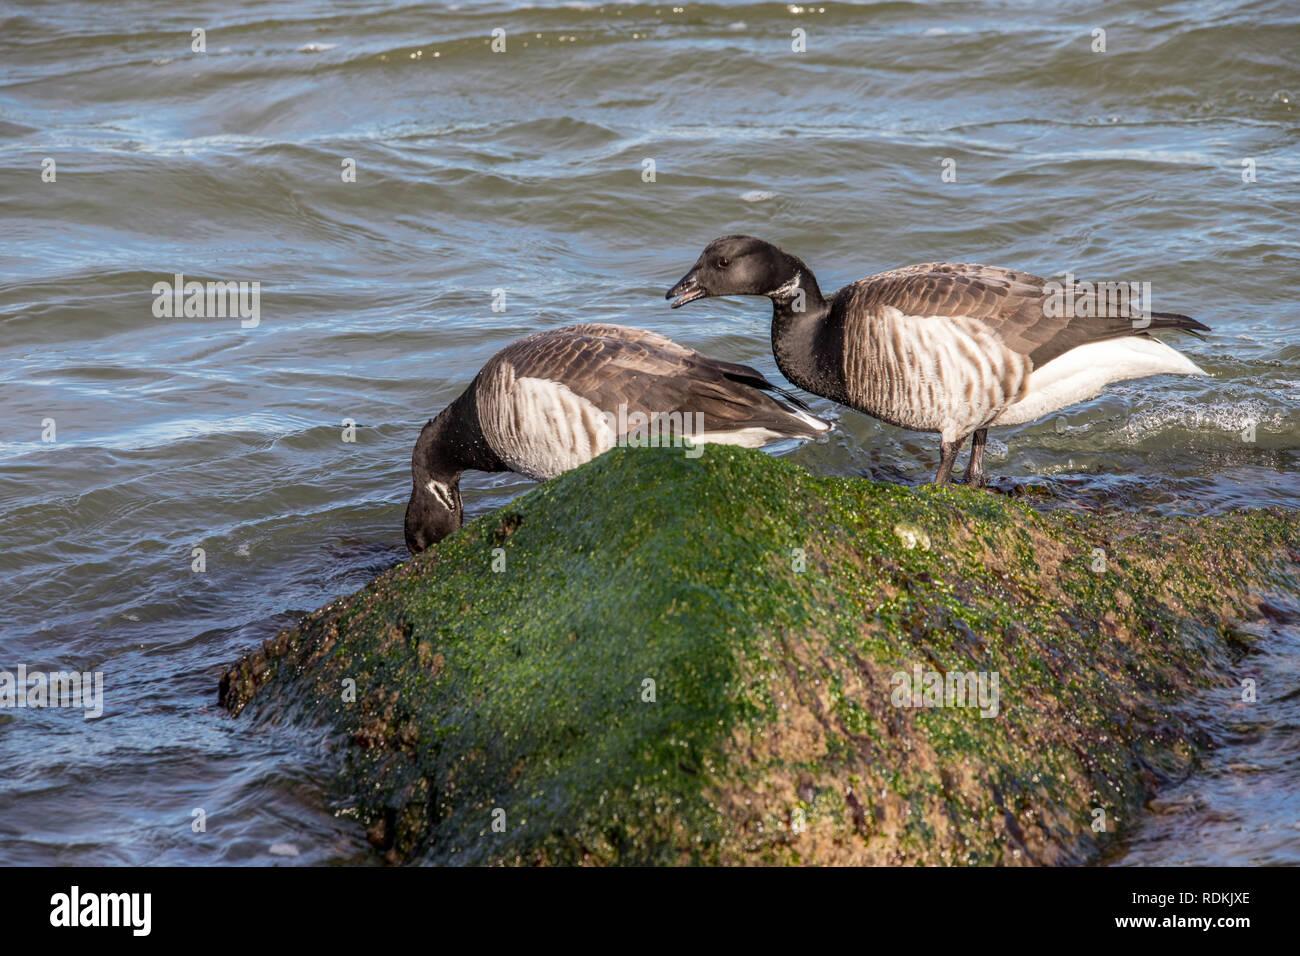 Brant Goose on the rocks - Stock Image